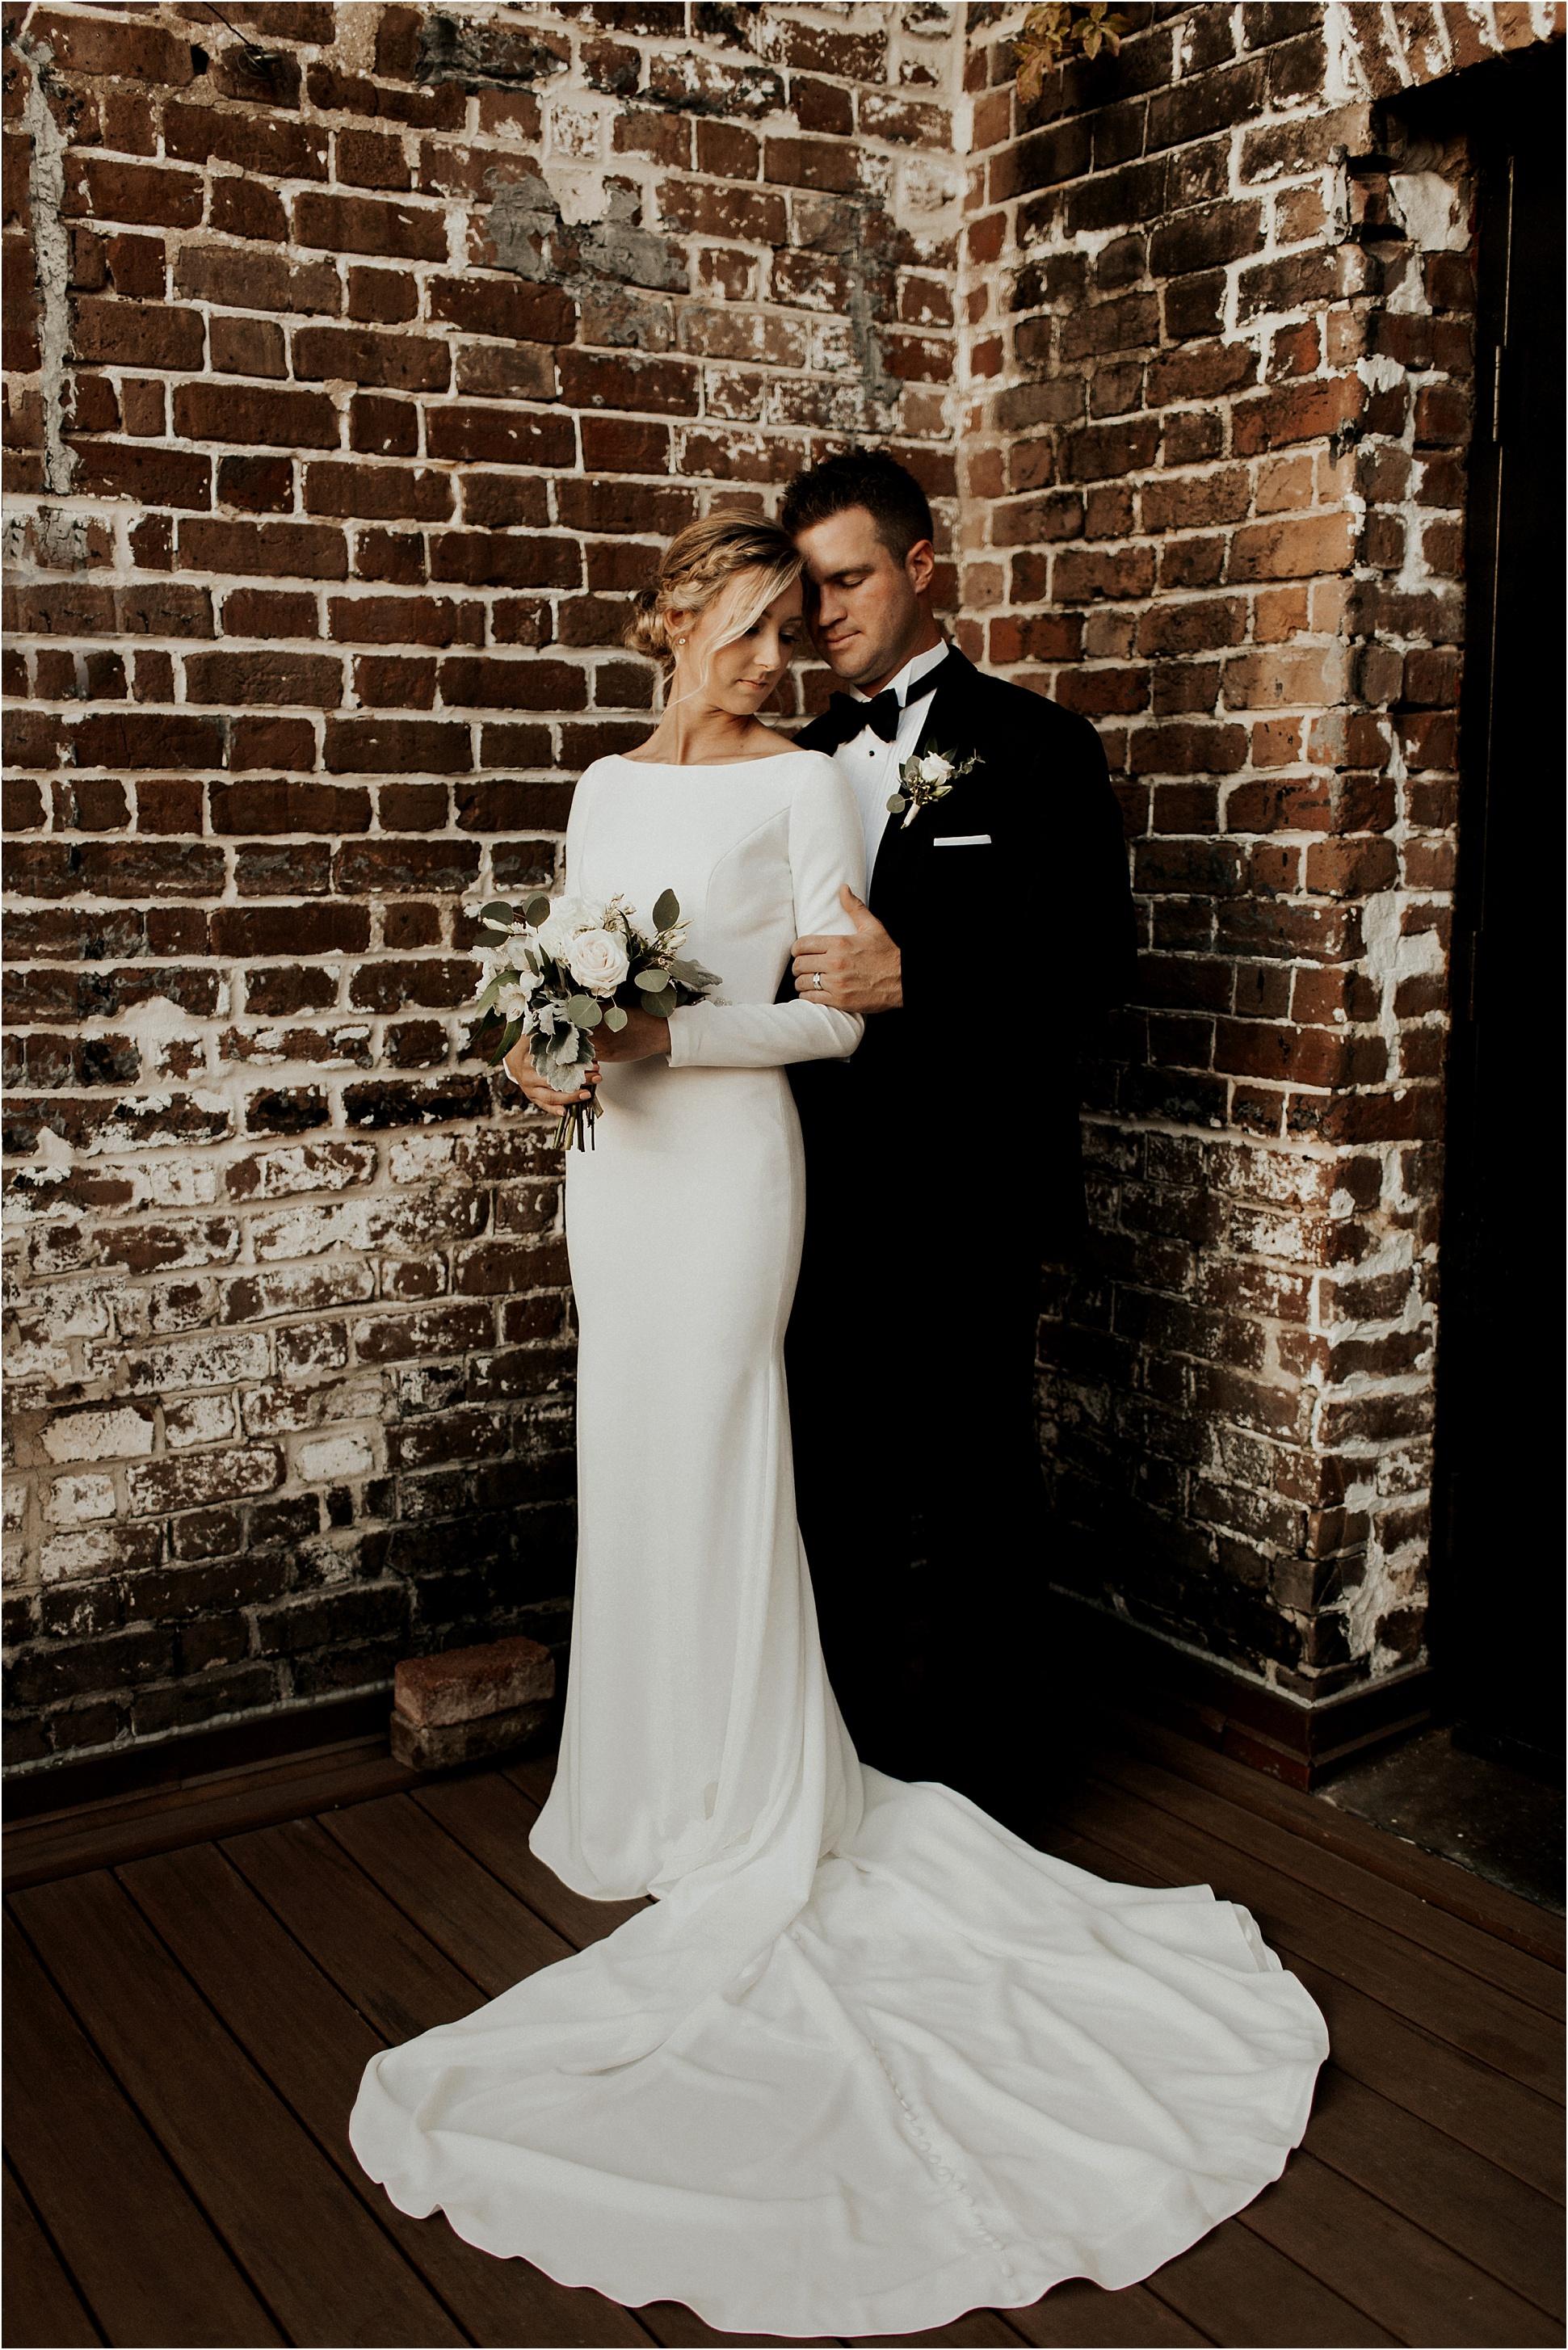 upstairs_midtown_intimate_charleston_wedding065.JPG